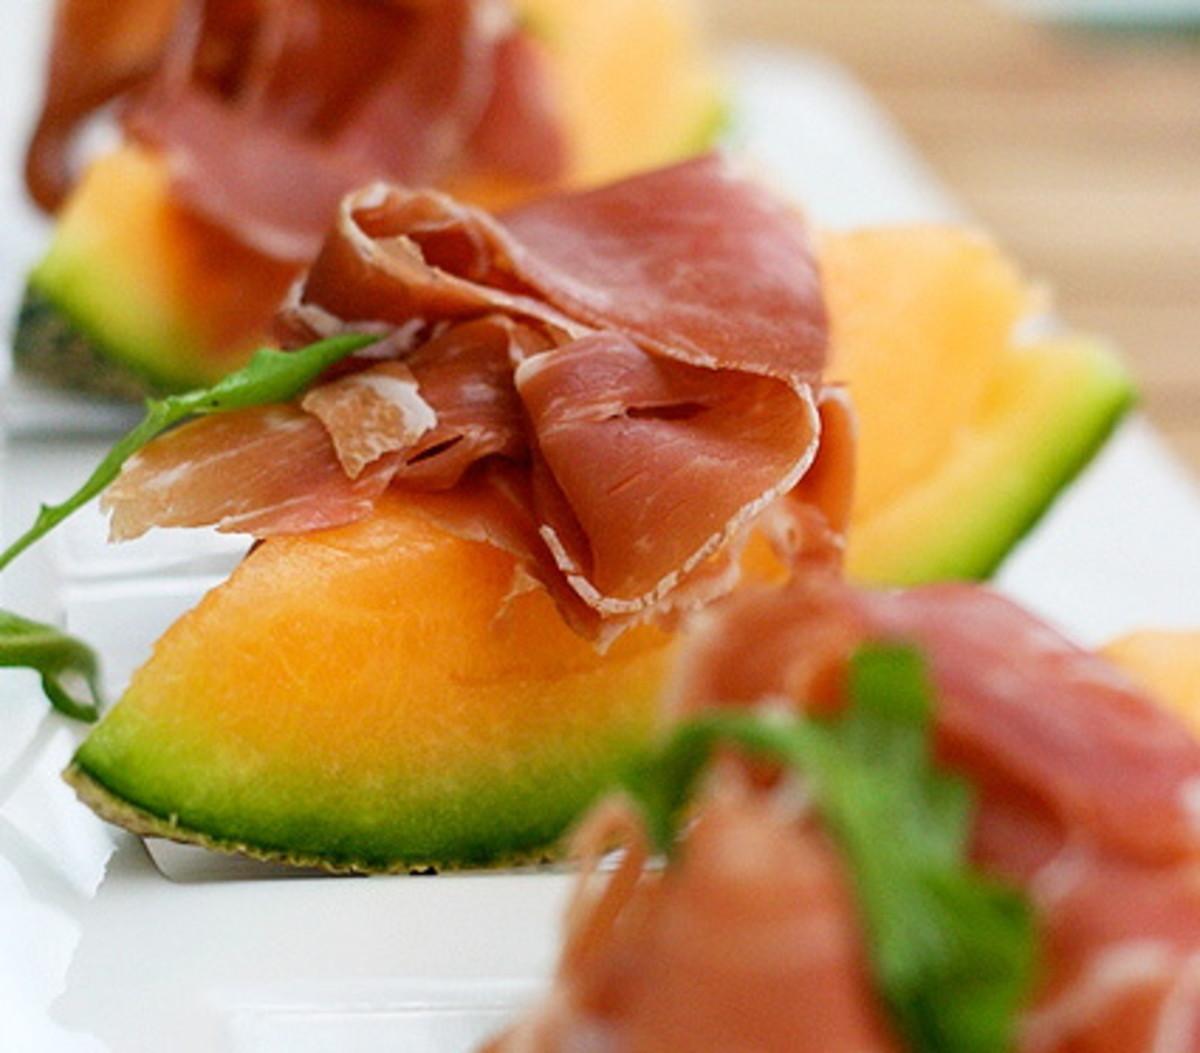 Melon and Parma Ham Starter